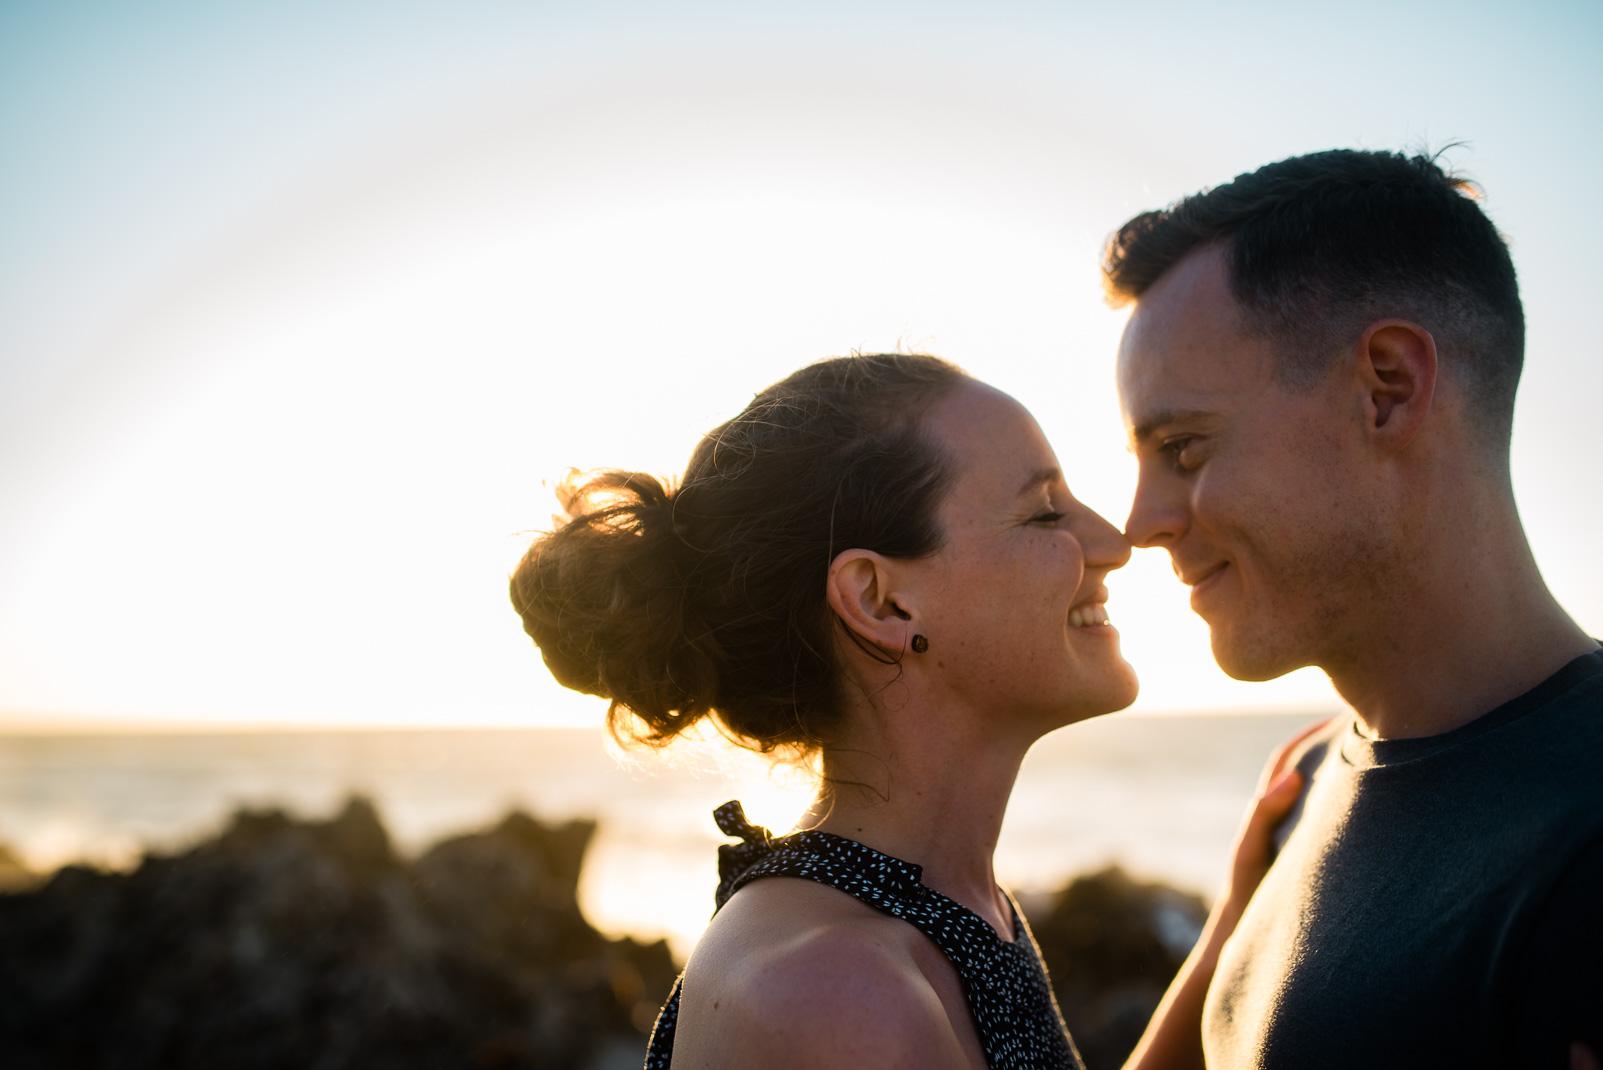 tim-jessica-beach-engagement-prewedding-photography-13.JPG